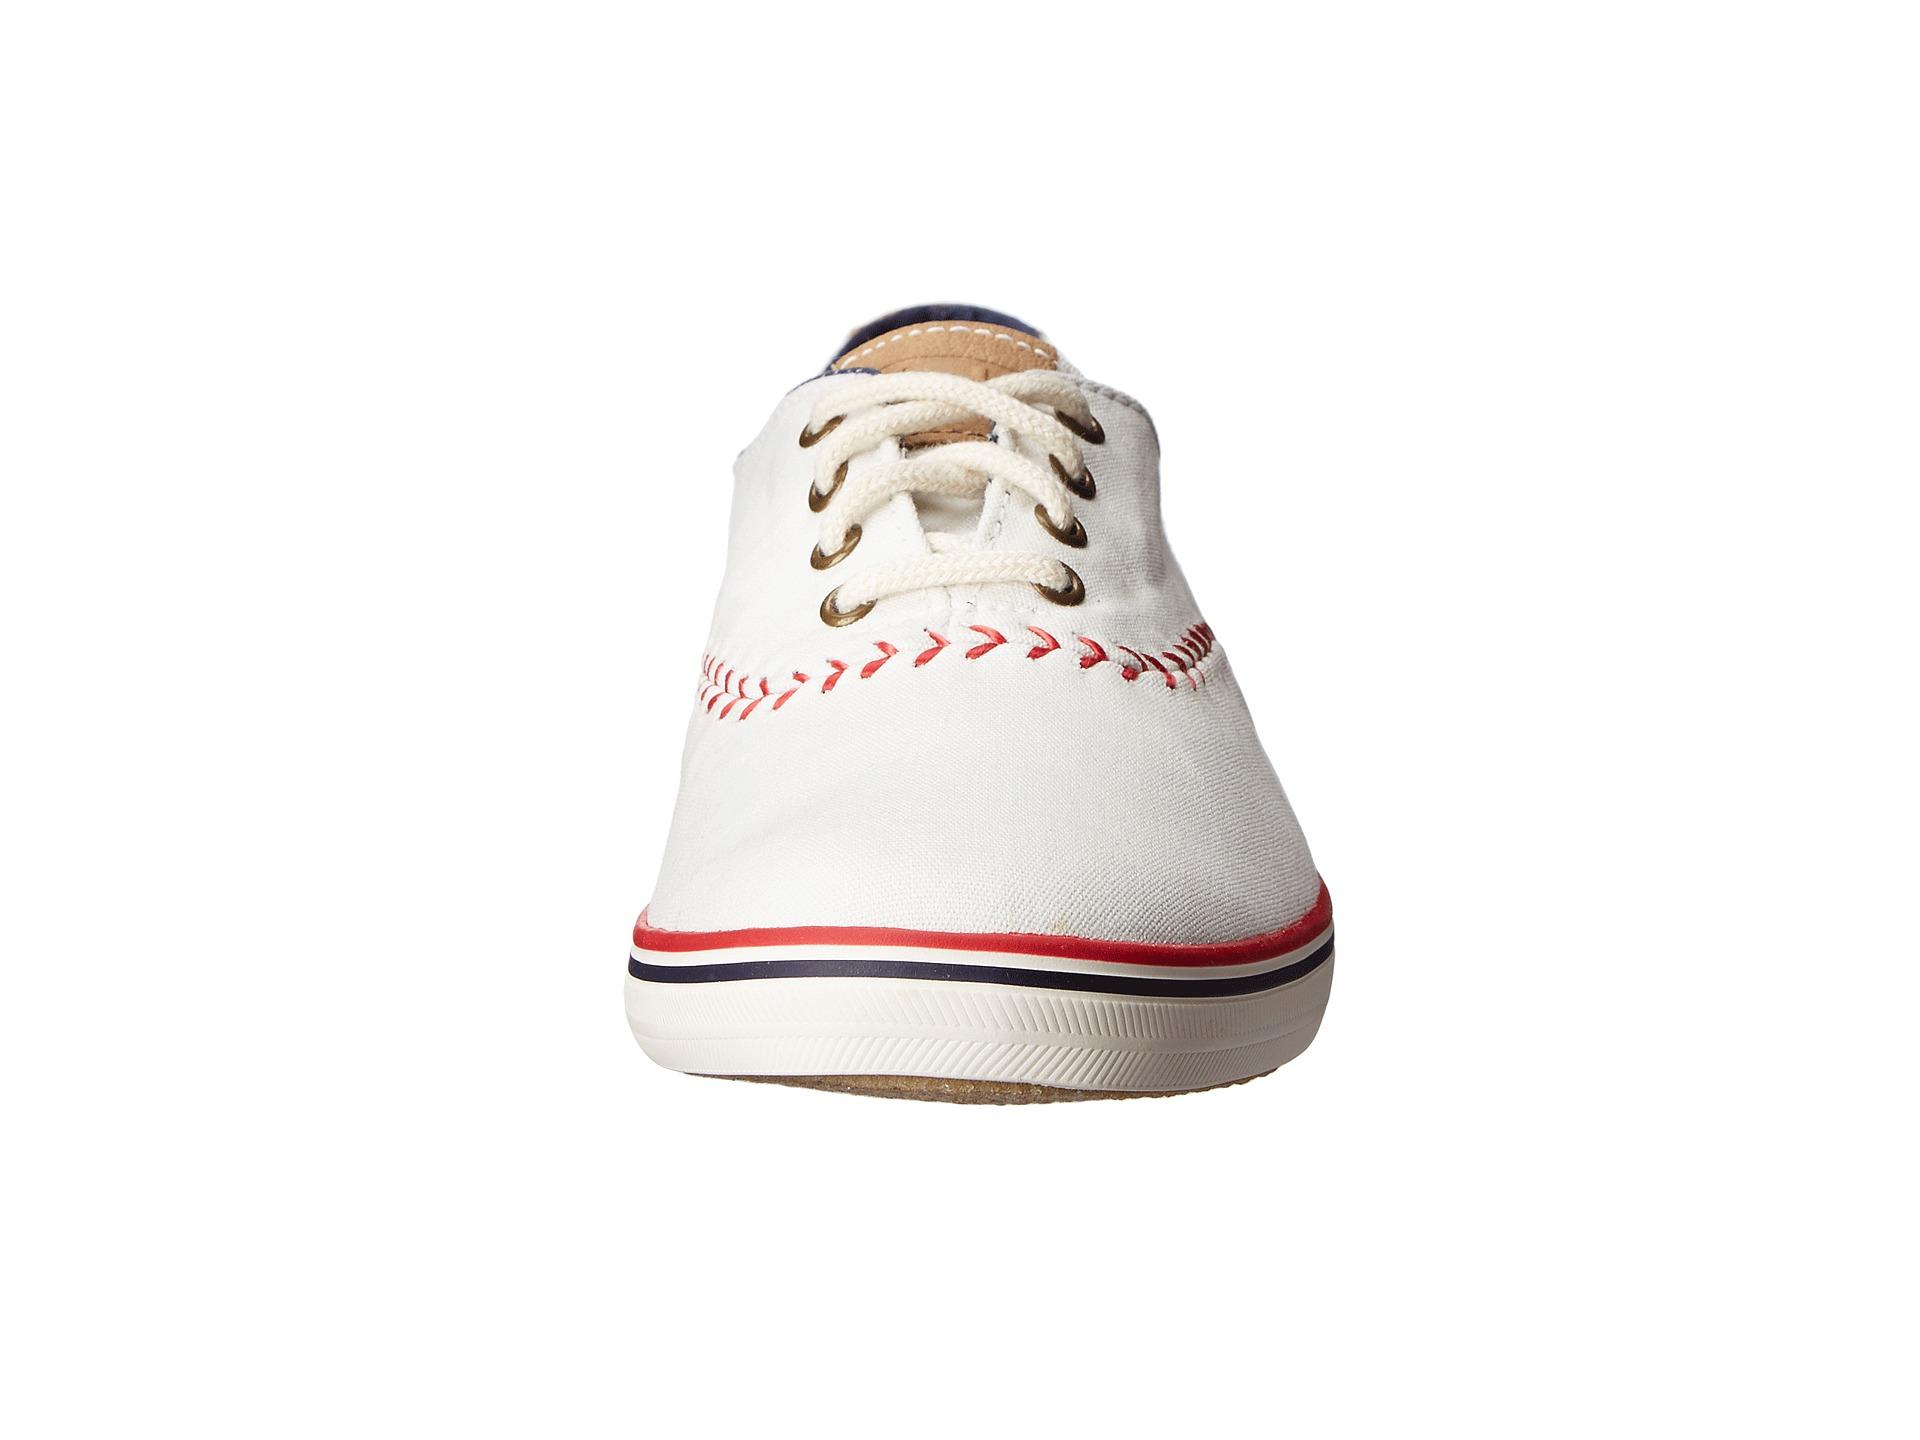 Keds Baseball Stitch Shoes Wide